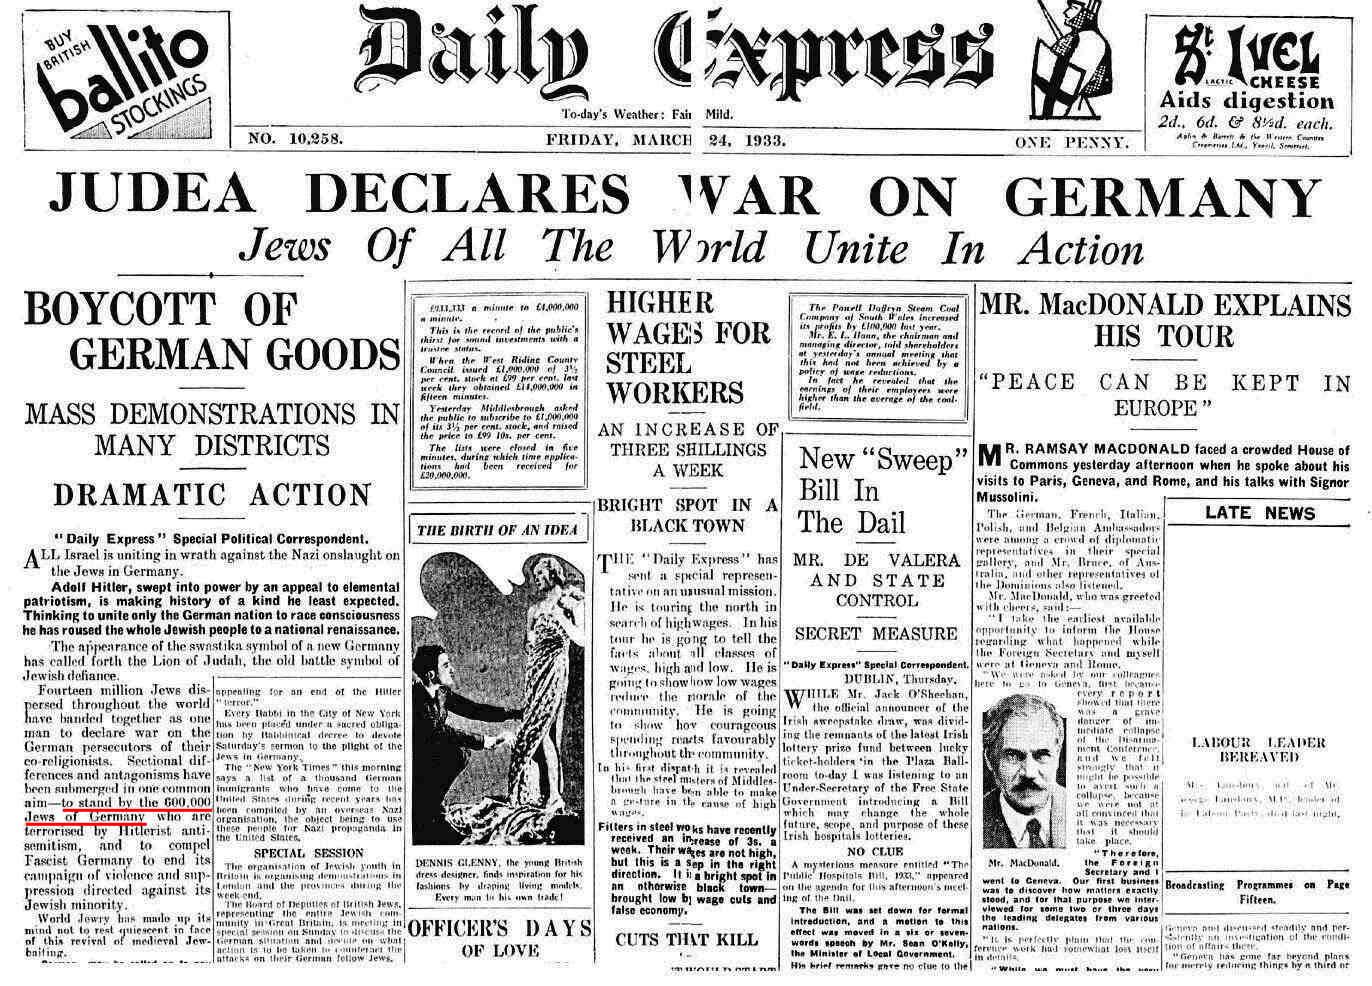 https://i2.wp.com/whatreallyhappened.com/IMAGES/judea_declares_war_on_germany.jpg